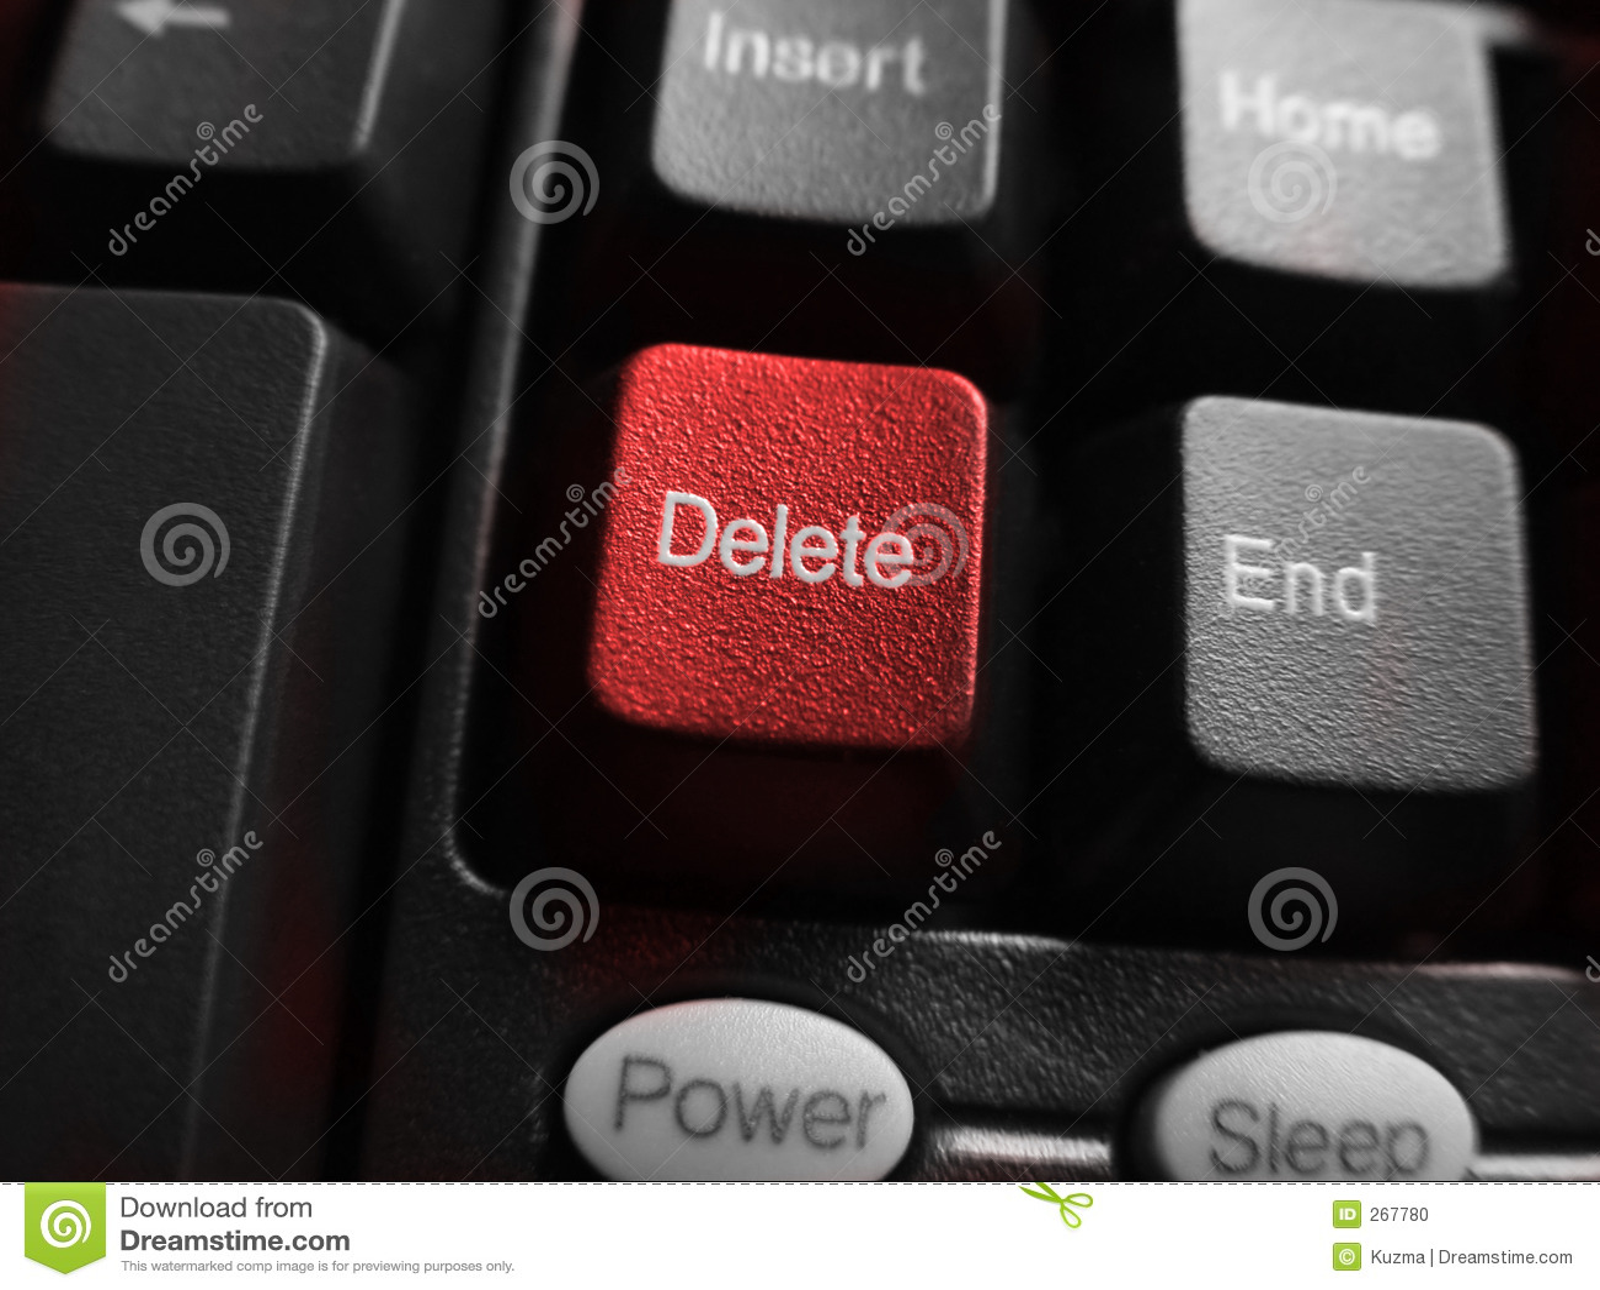 how to delete a macro